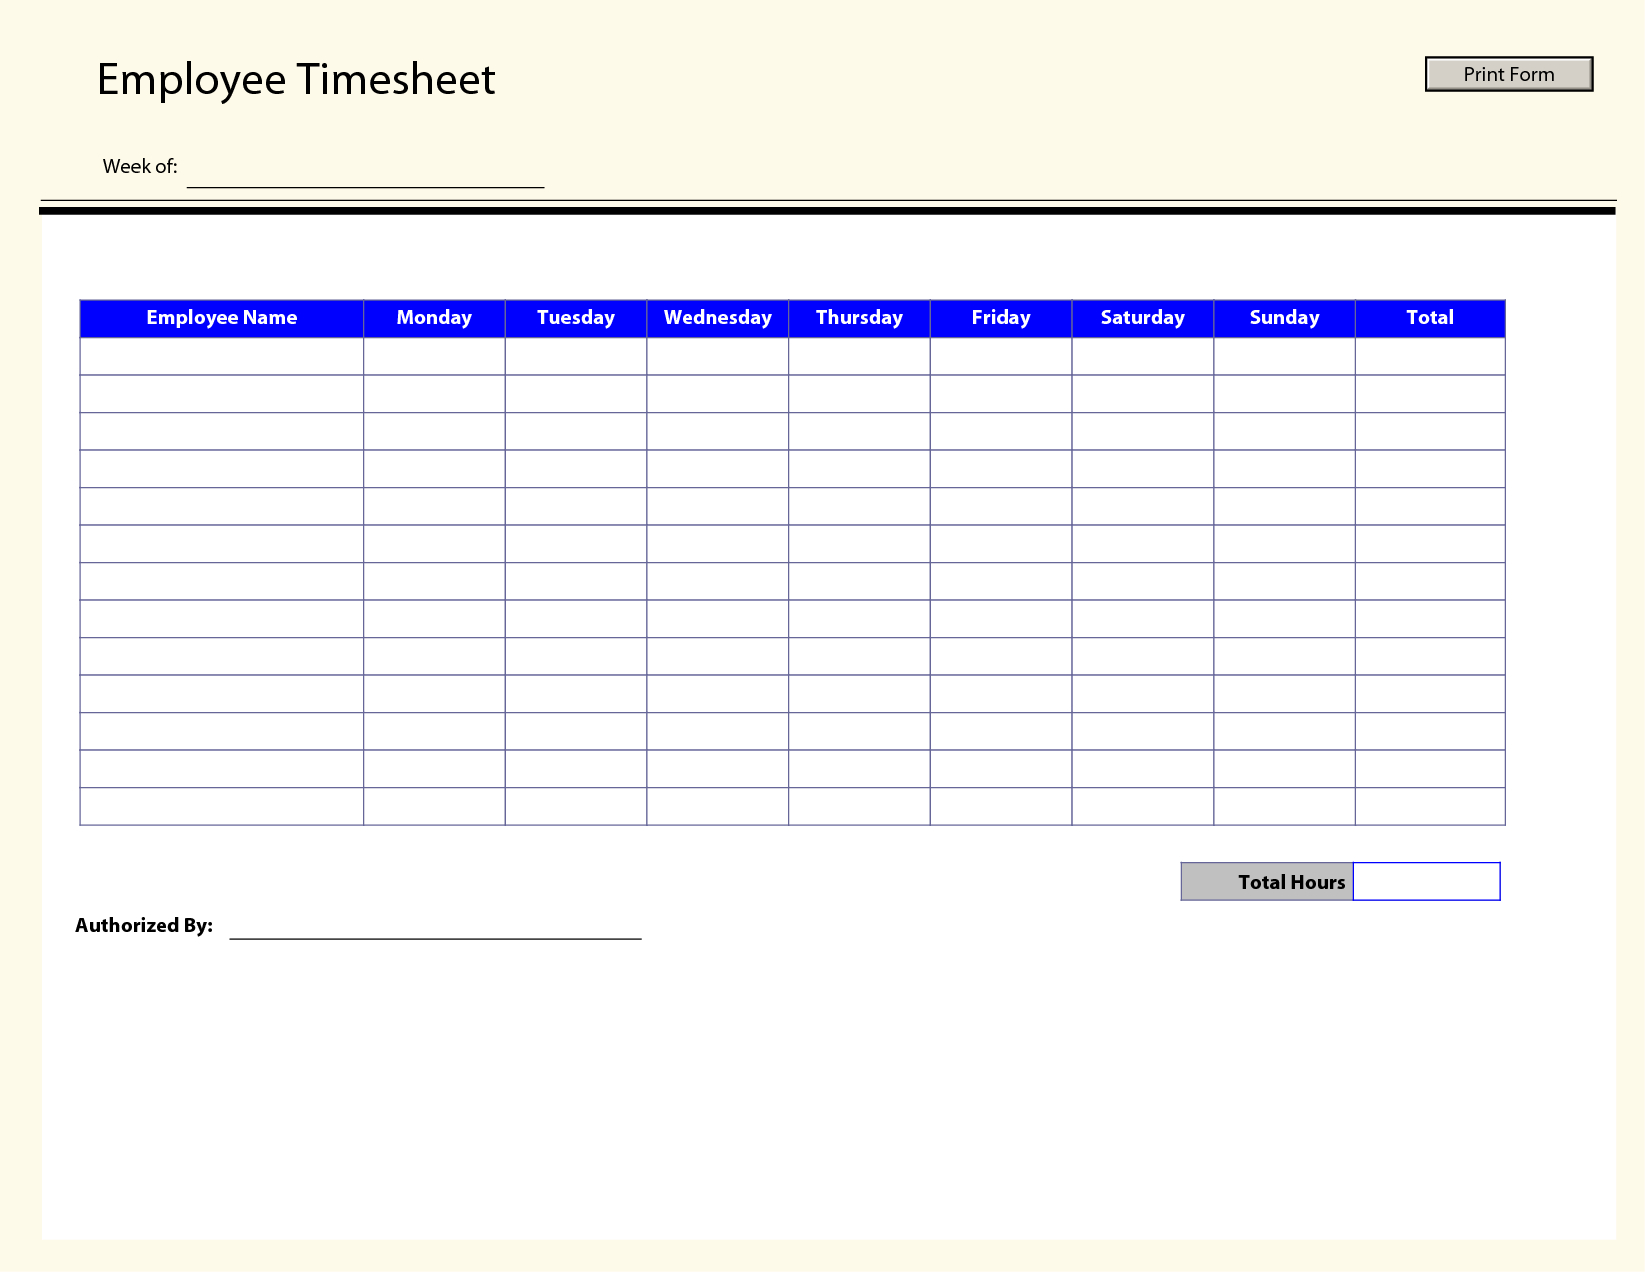 Timesheet Spreadsheet Free Regarding Timesheet Invoice Template Free And Blank Employee Timesheet